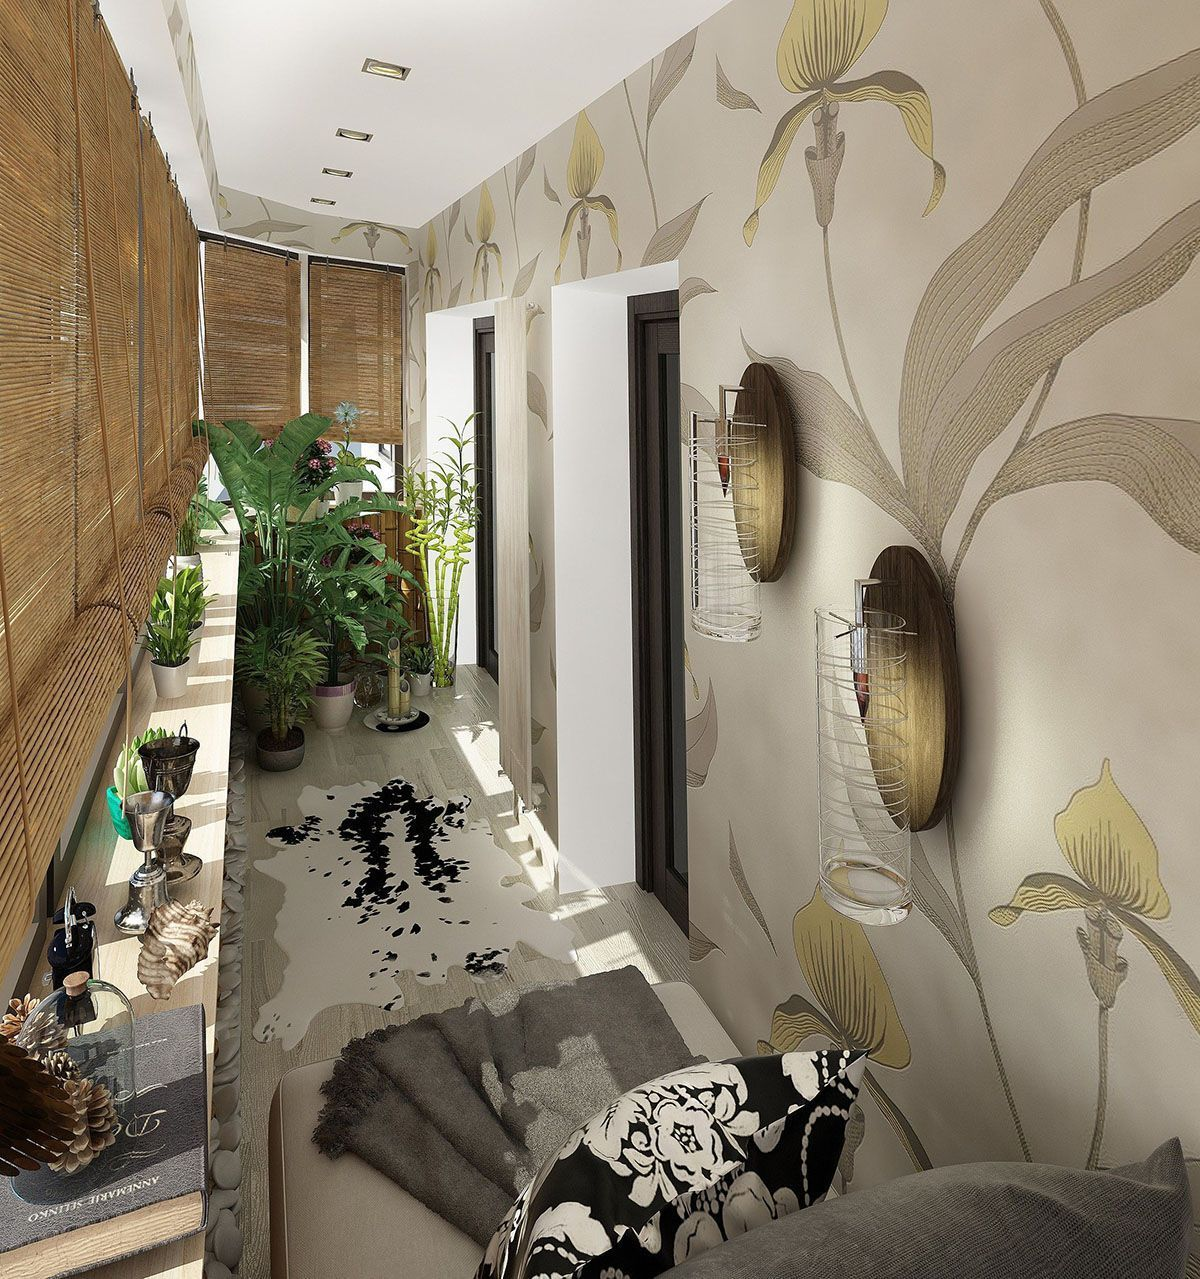 Балкон: дизайн интерьеров